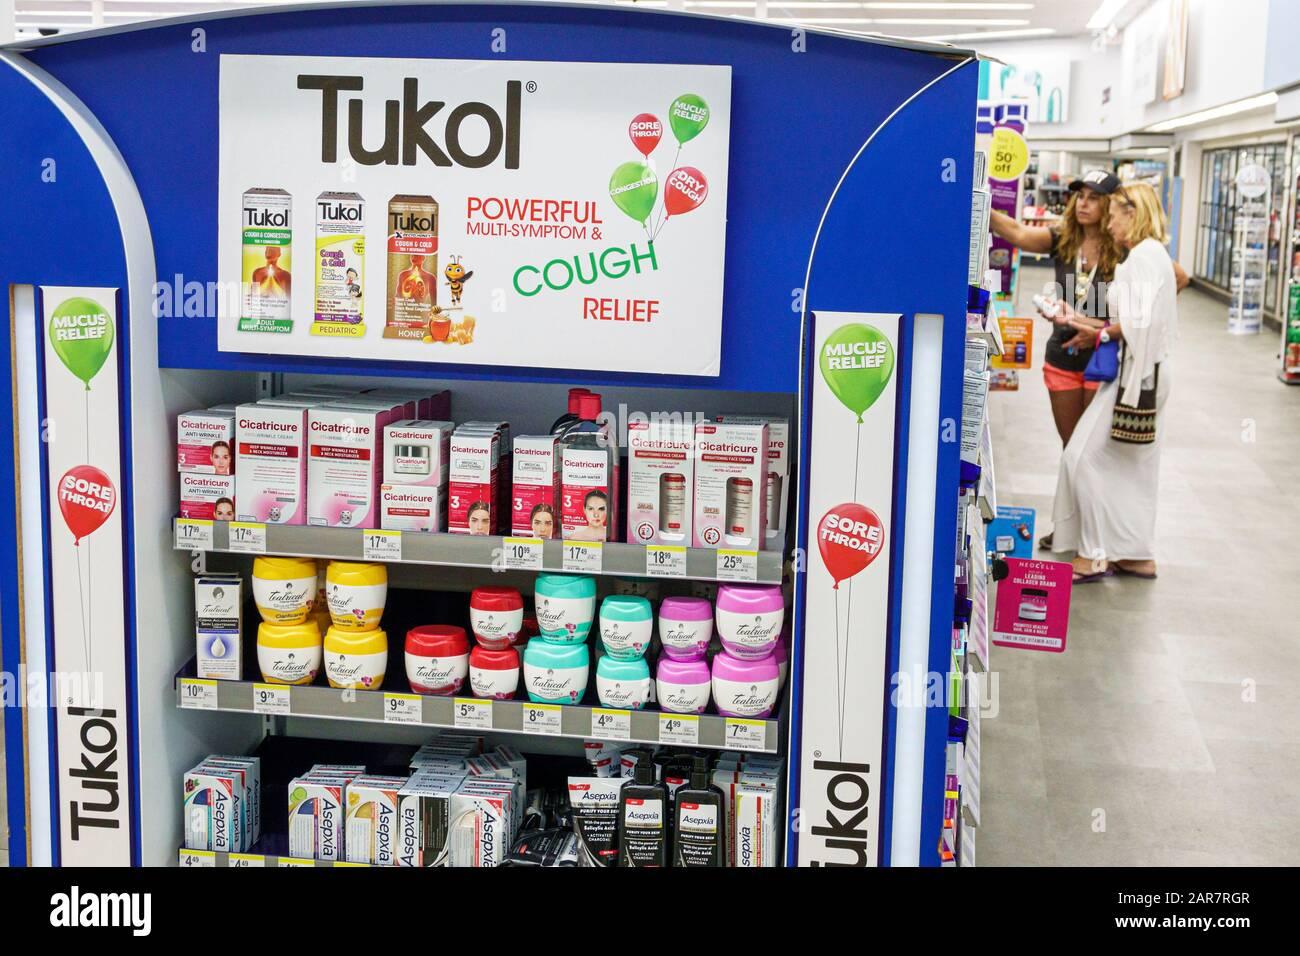 Florida Miami Beach Walgreens Hustenentlastung OTC über dem Ladenverkauf der Tukol-Arznei Stockfoto